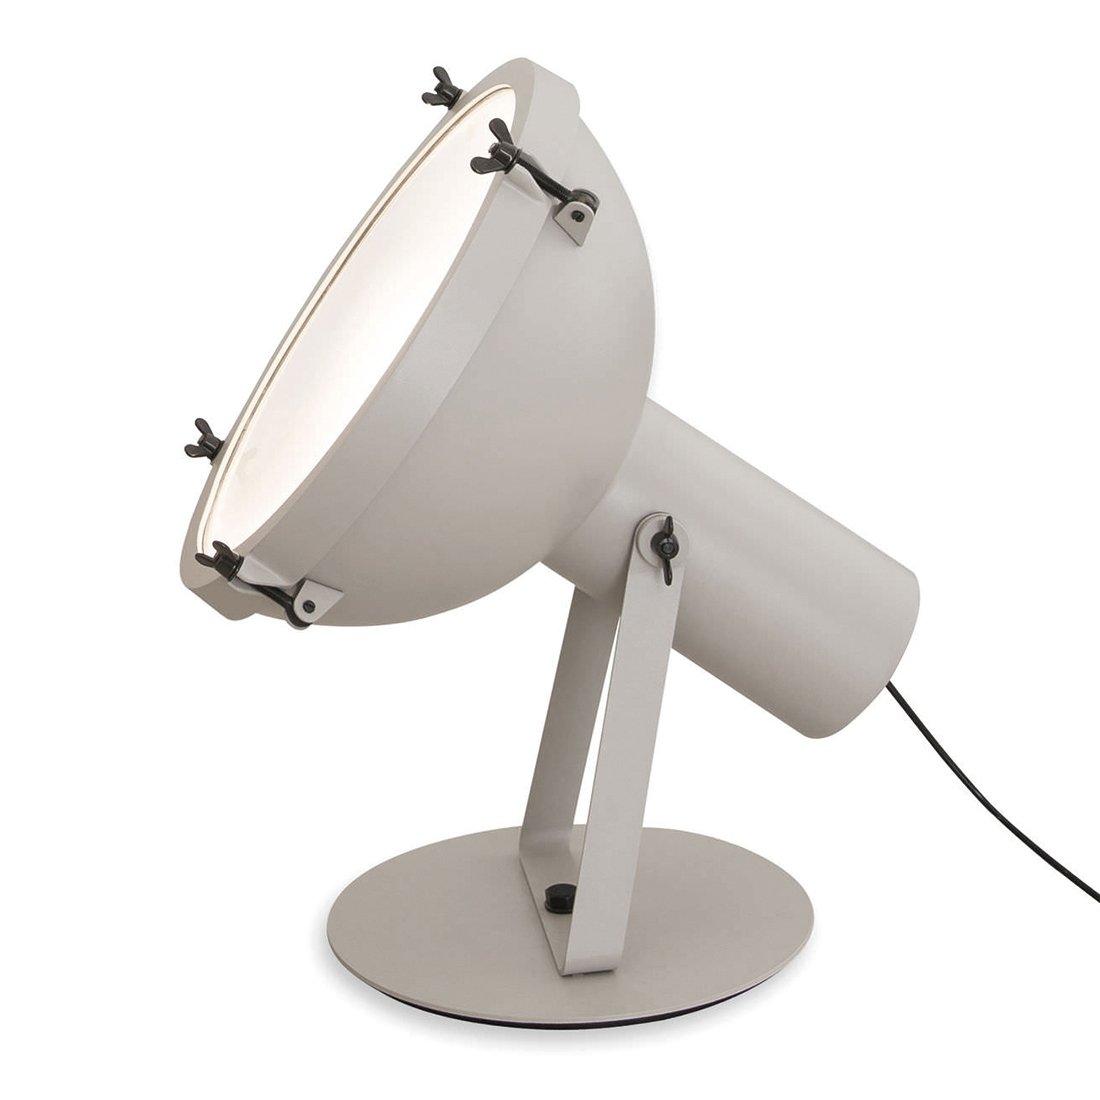 NEMO Projecteur 365 Vloerlamp Tafellamp White Sand